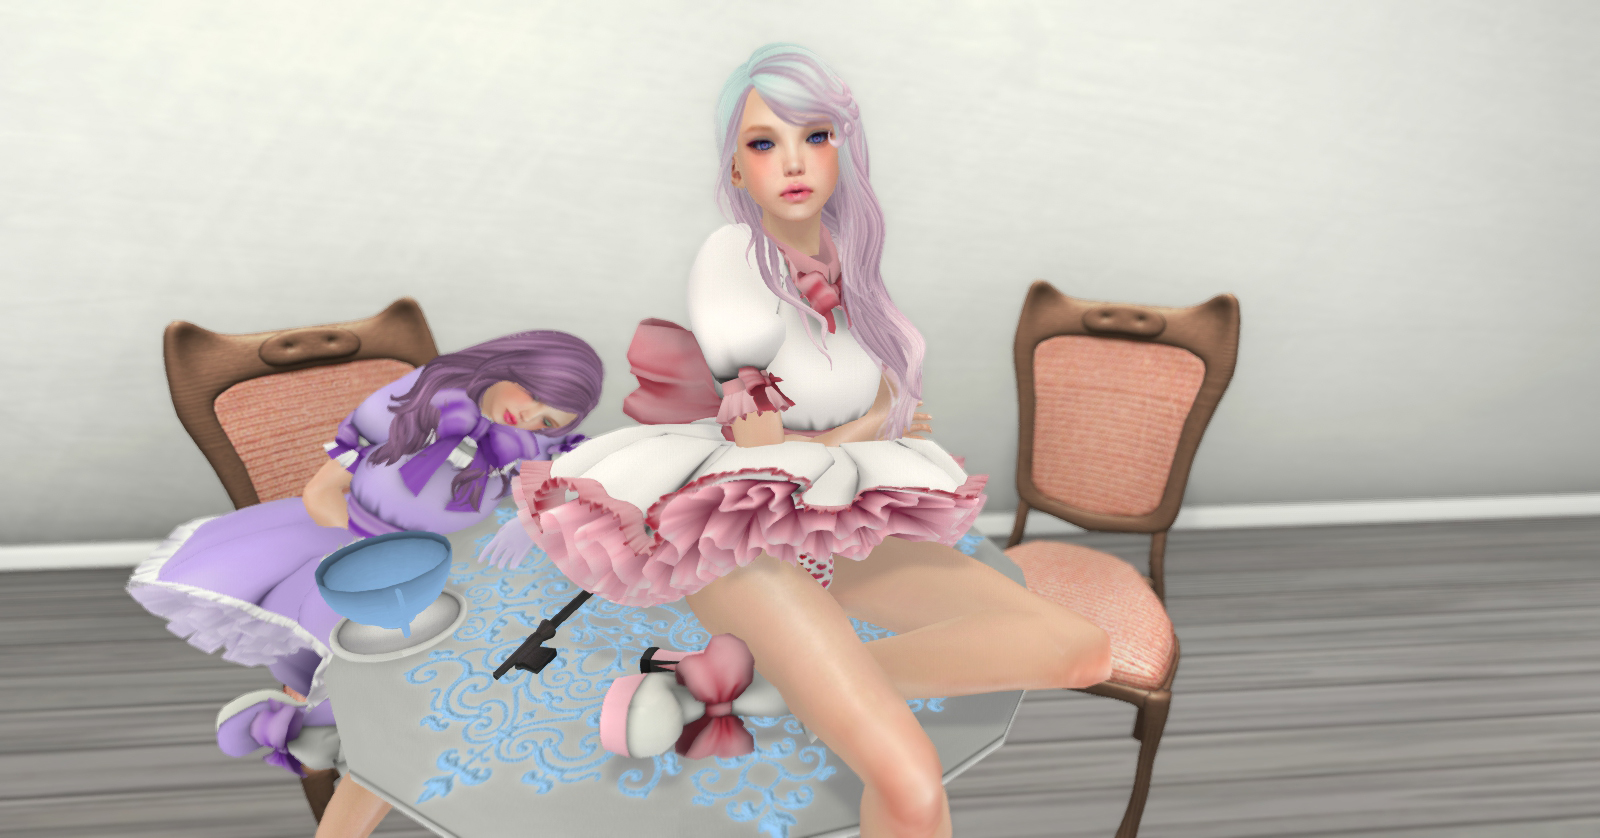 sissy attire Gallery